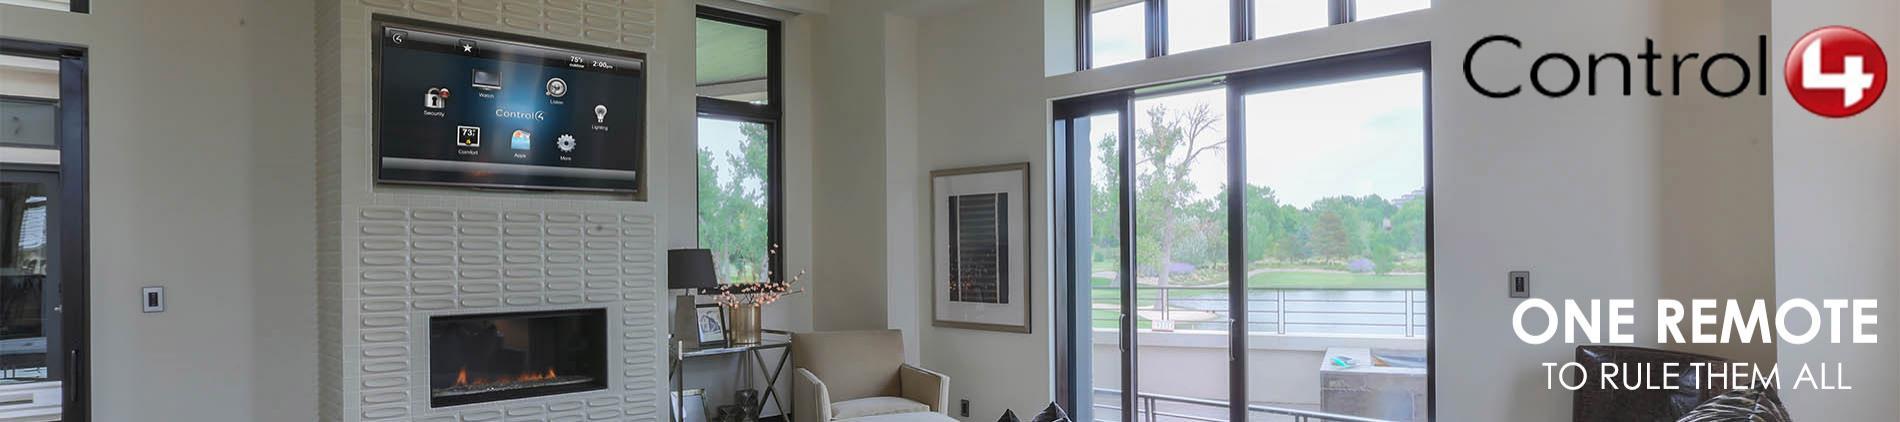 Control4, Living, Room, White, TV, Fireplace, Glass, door,